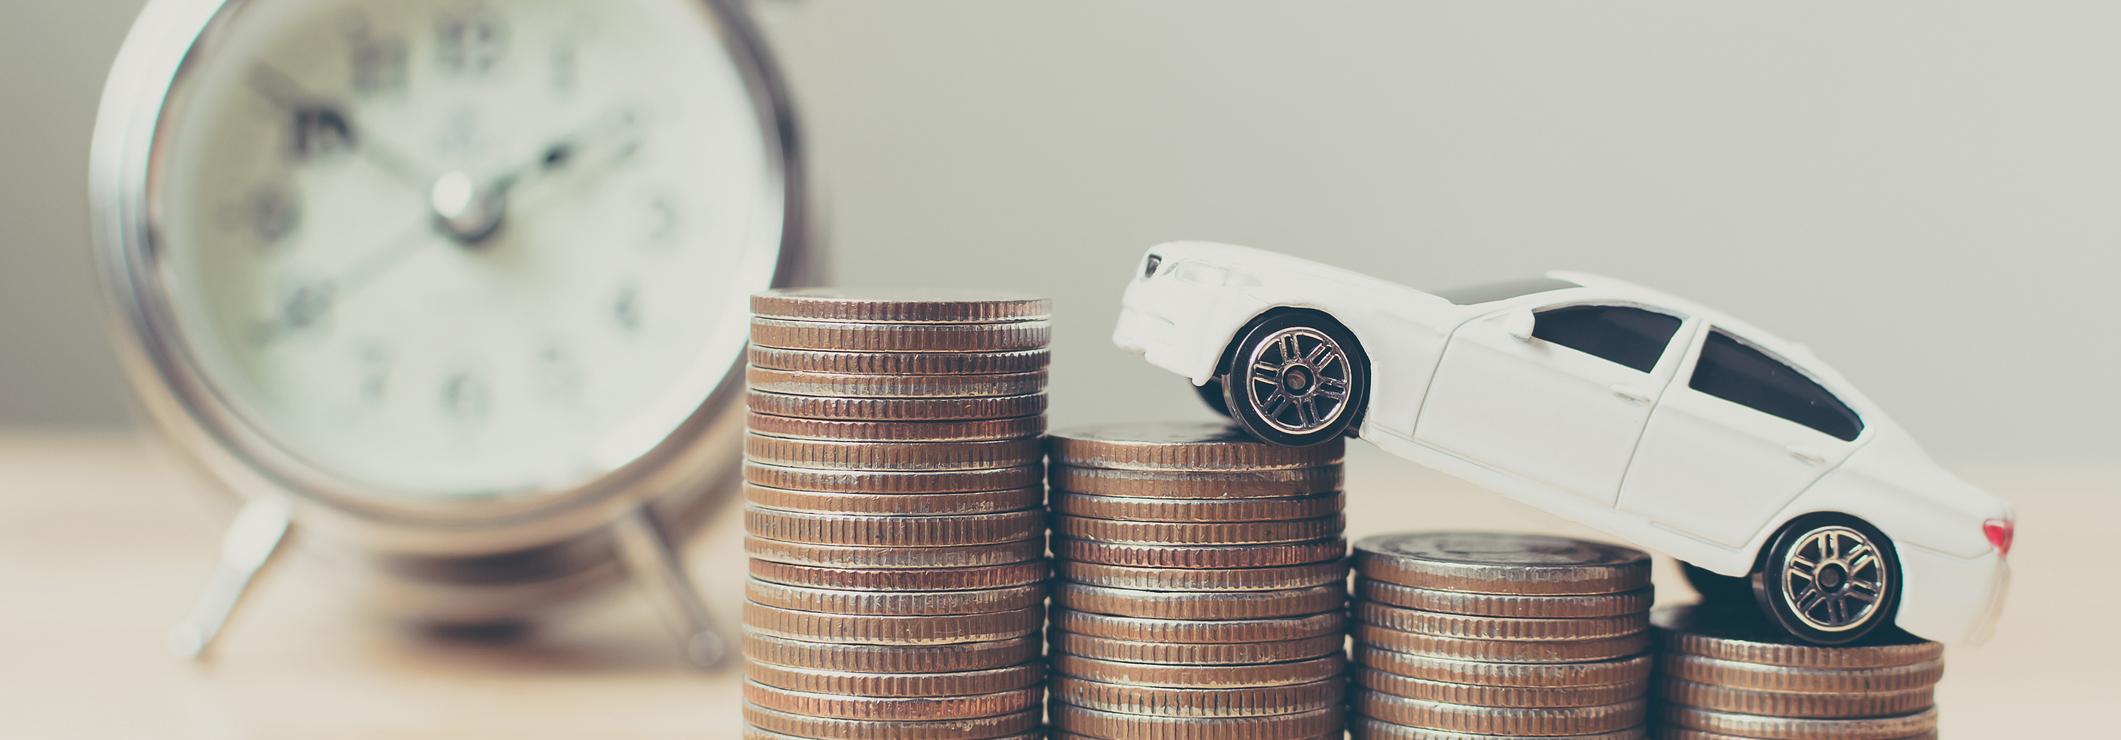 Used Vehicle Financing near Overland Park, KS 66212